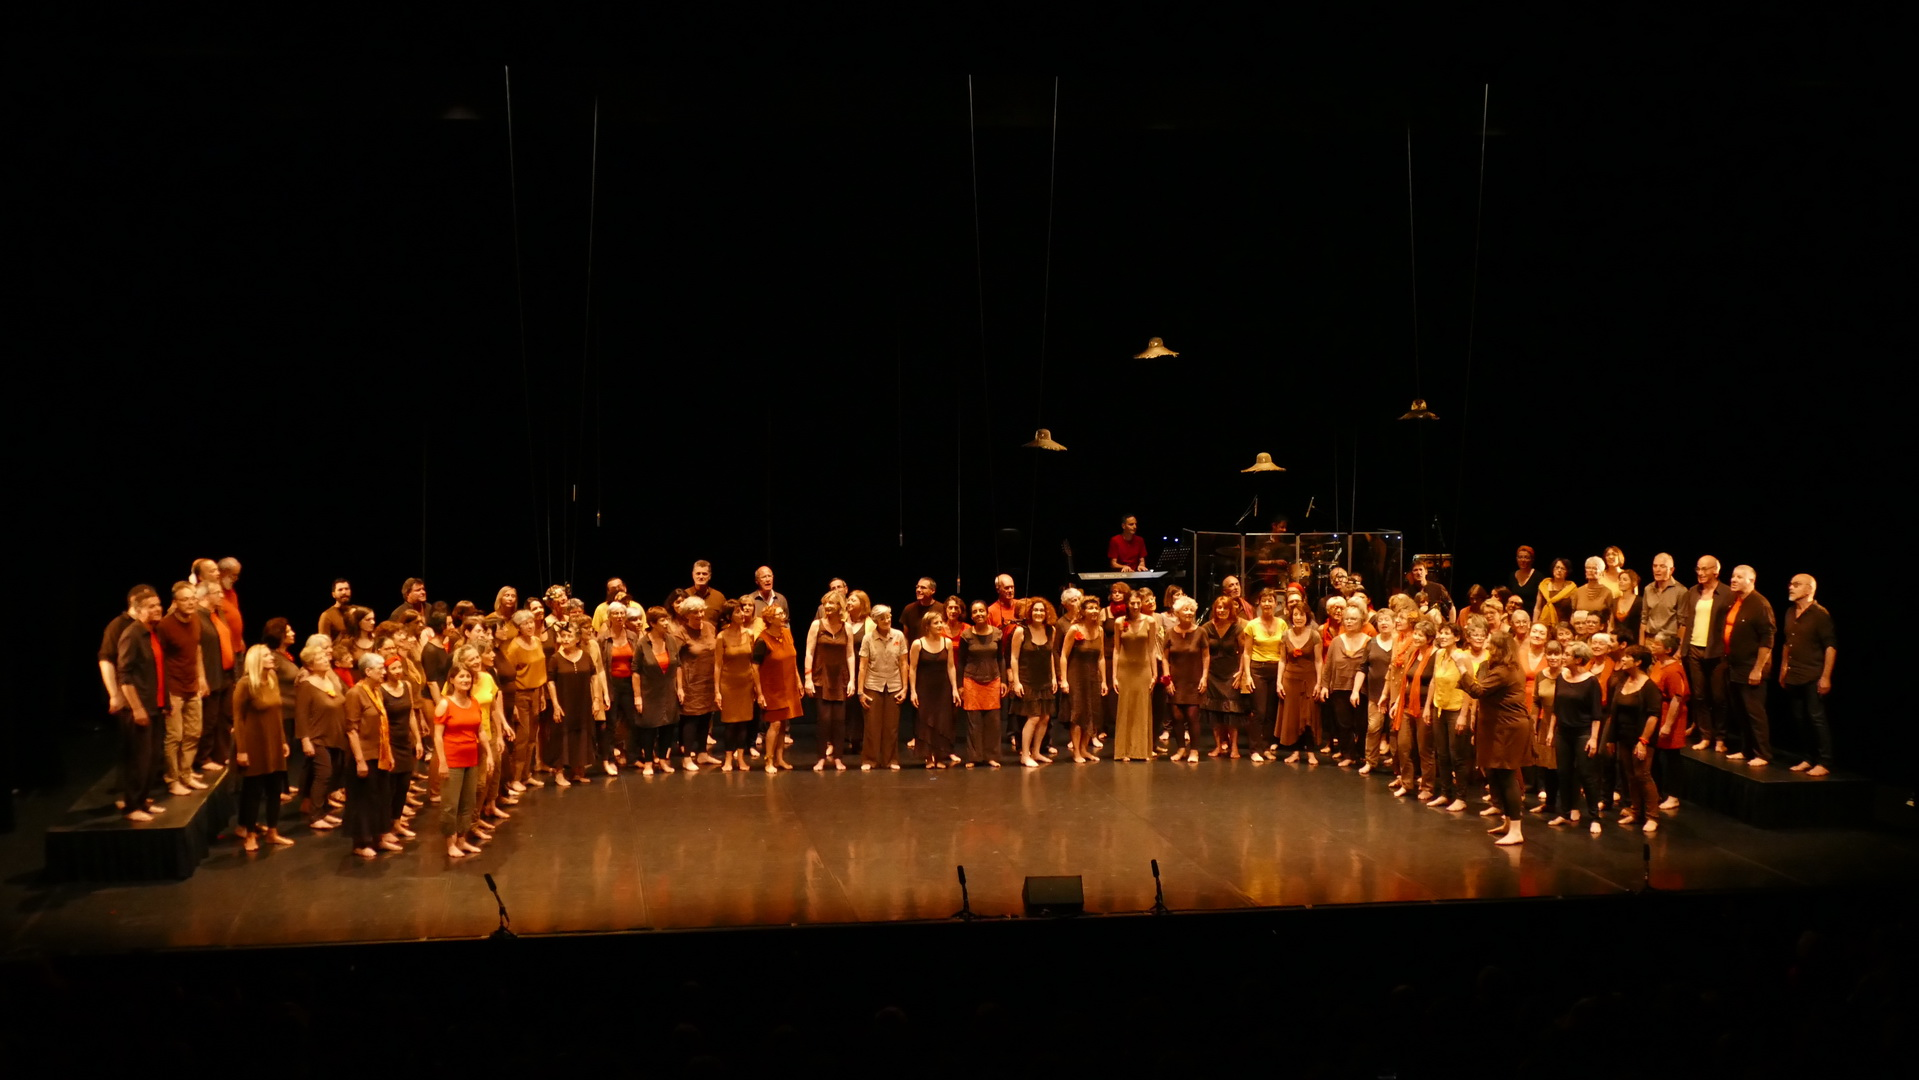 LFDS_concert_ailleurs (60)